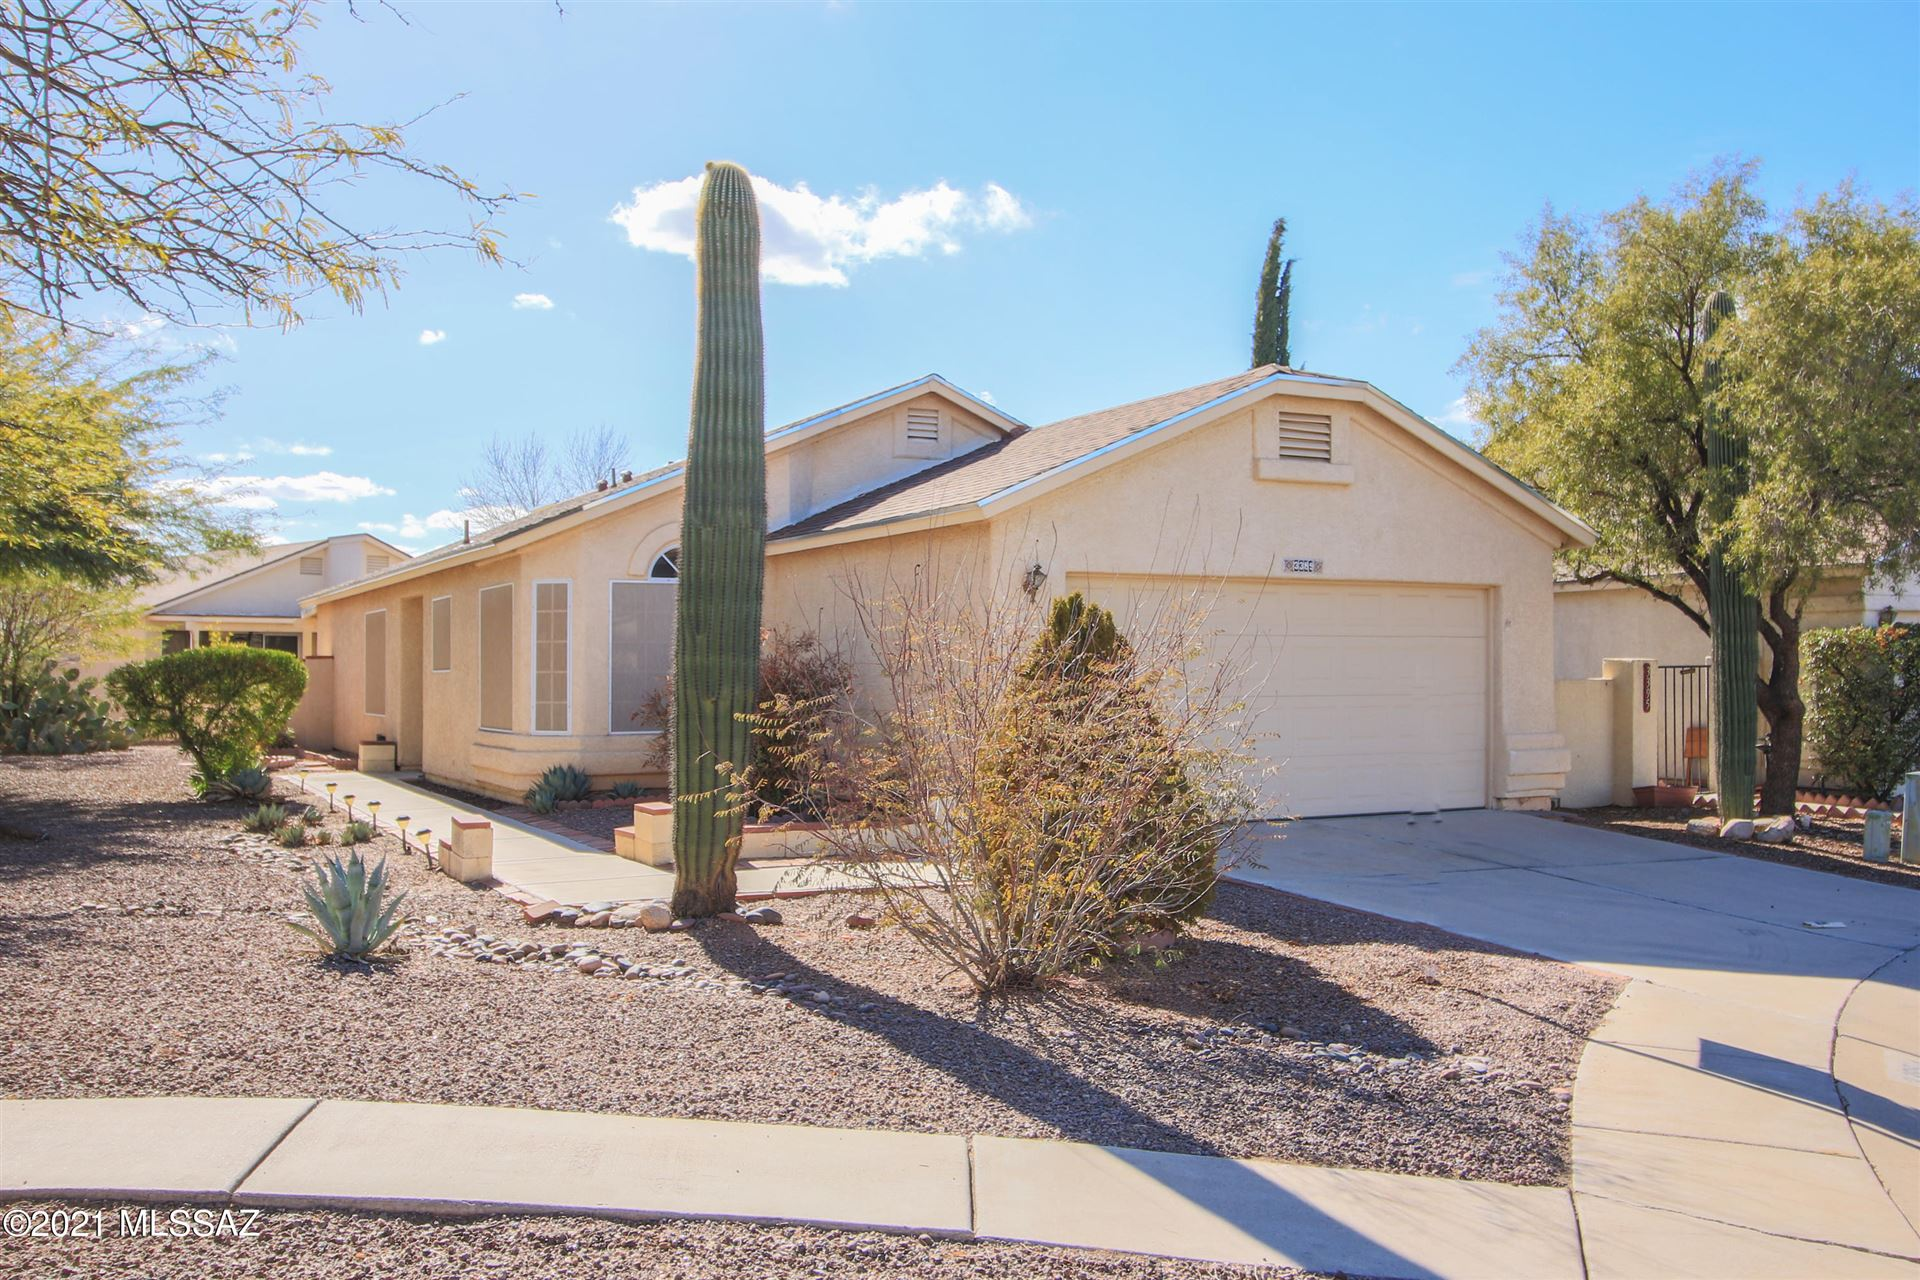 3389 W Tranquility Court, Tucson, AZ 85741 - MLS#: 22101893